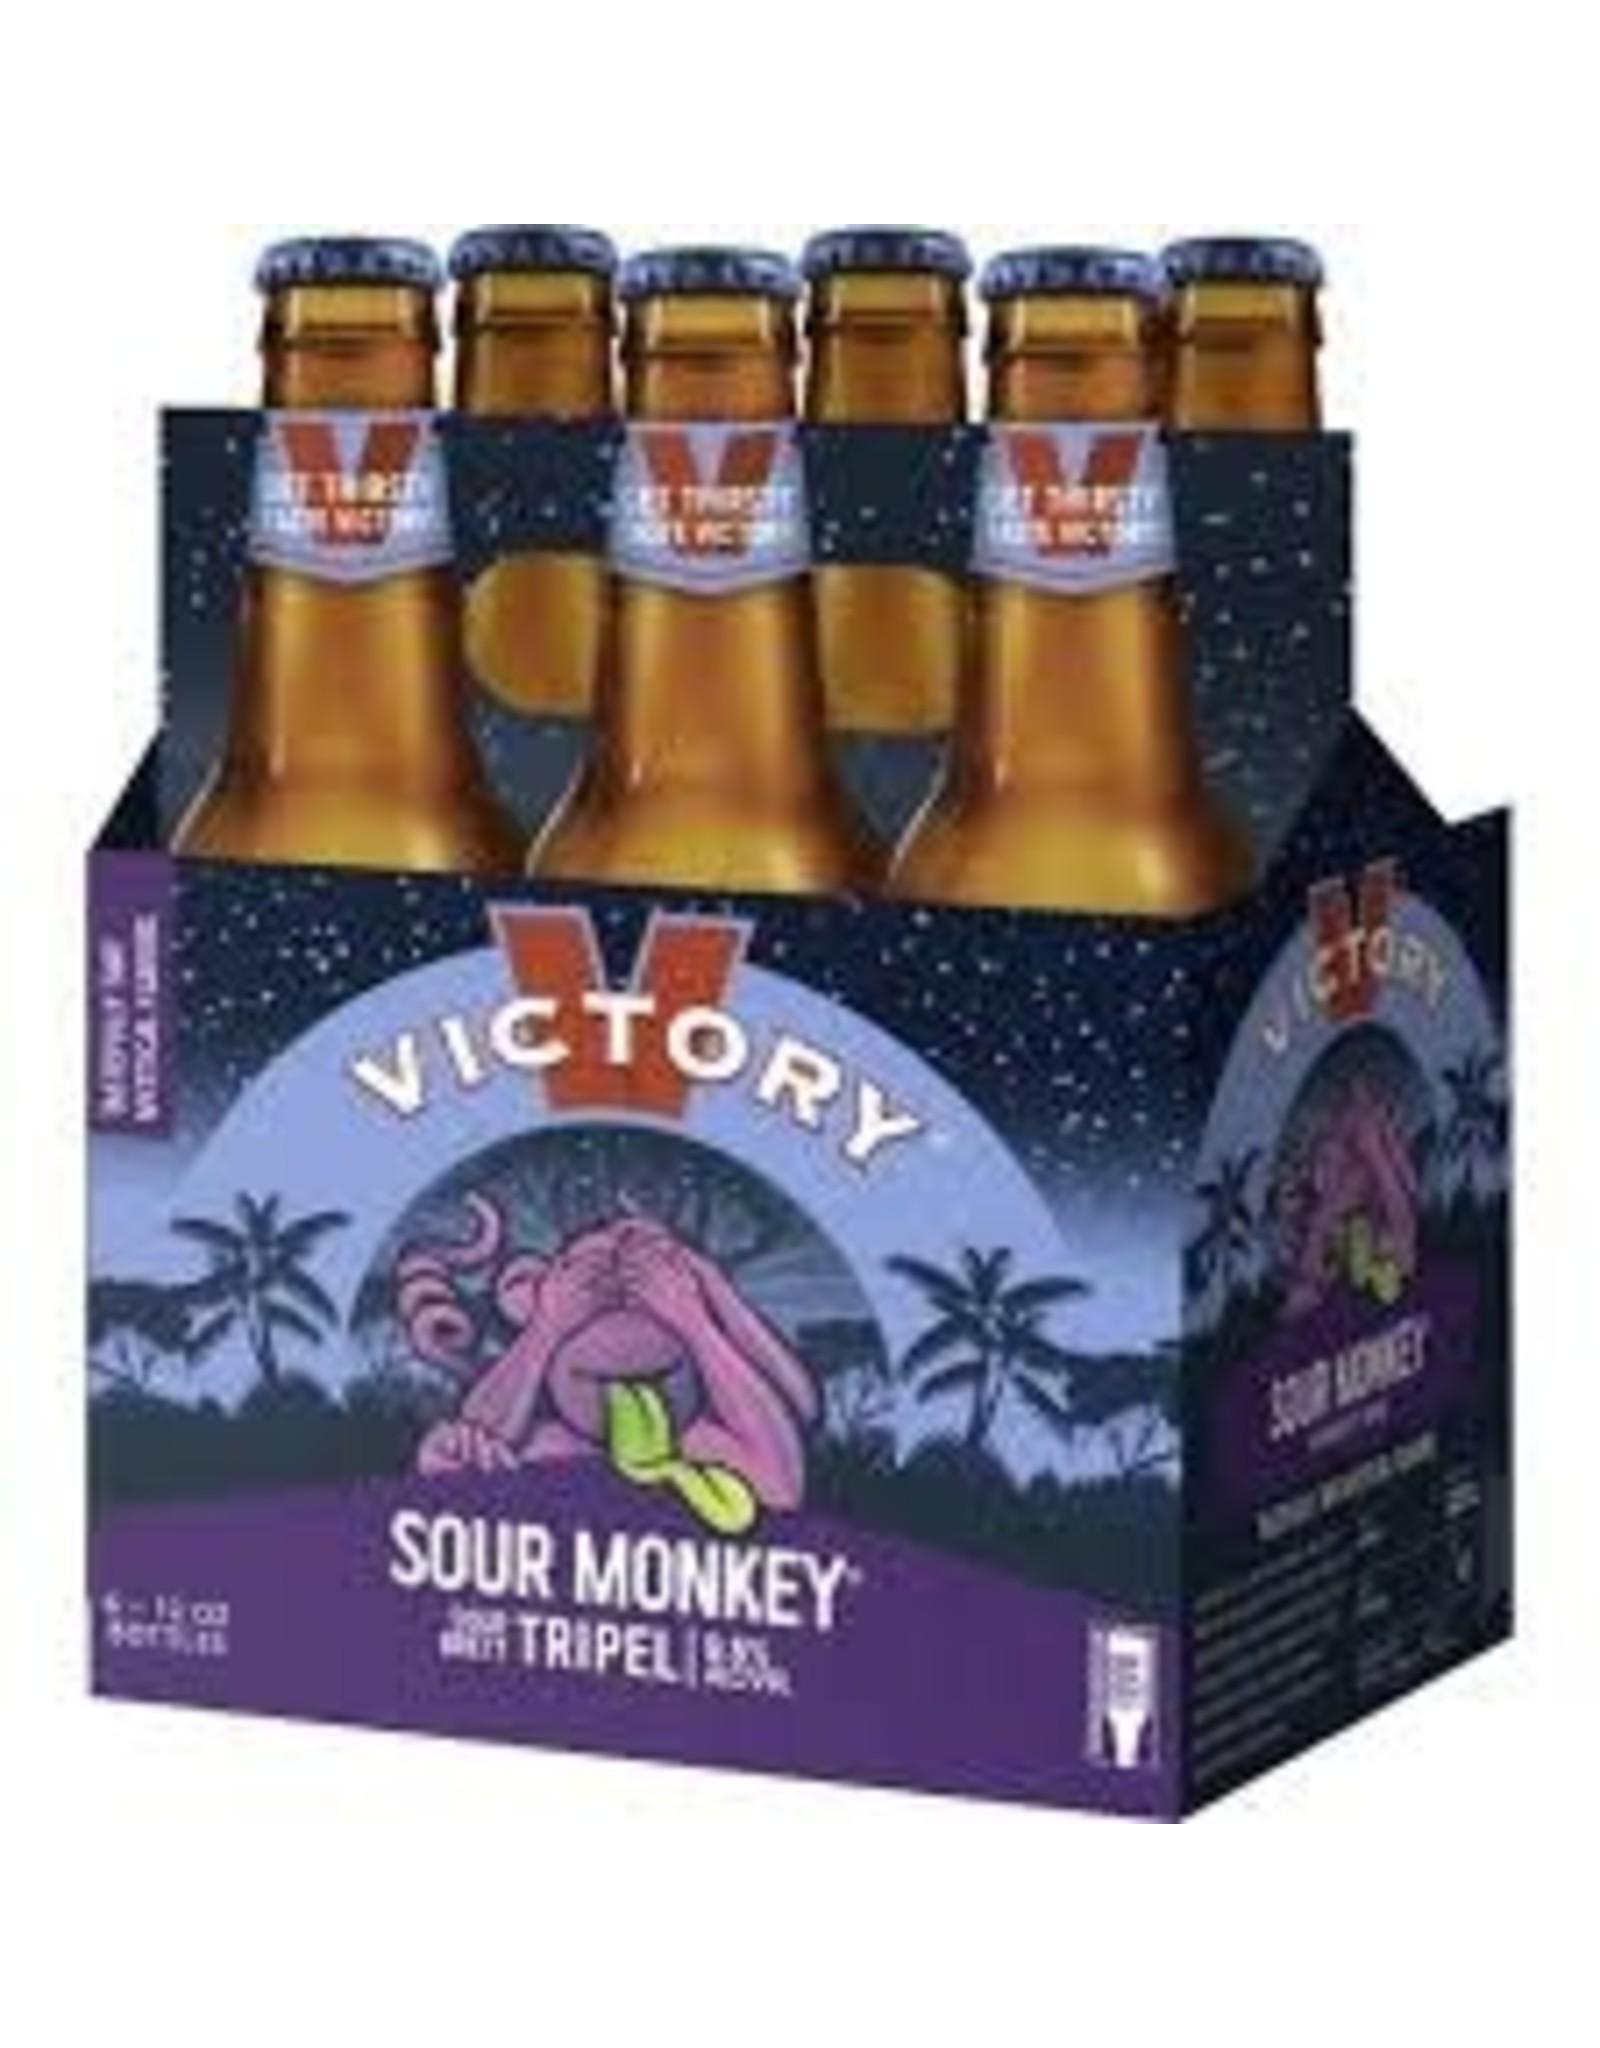 Victory Victory Sour Monkey 6pk bottle